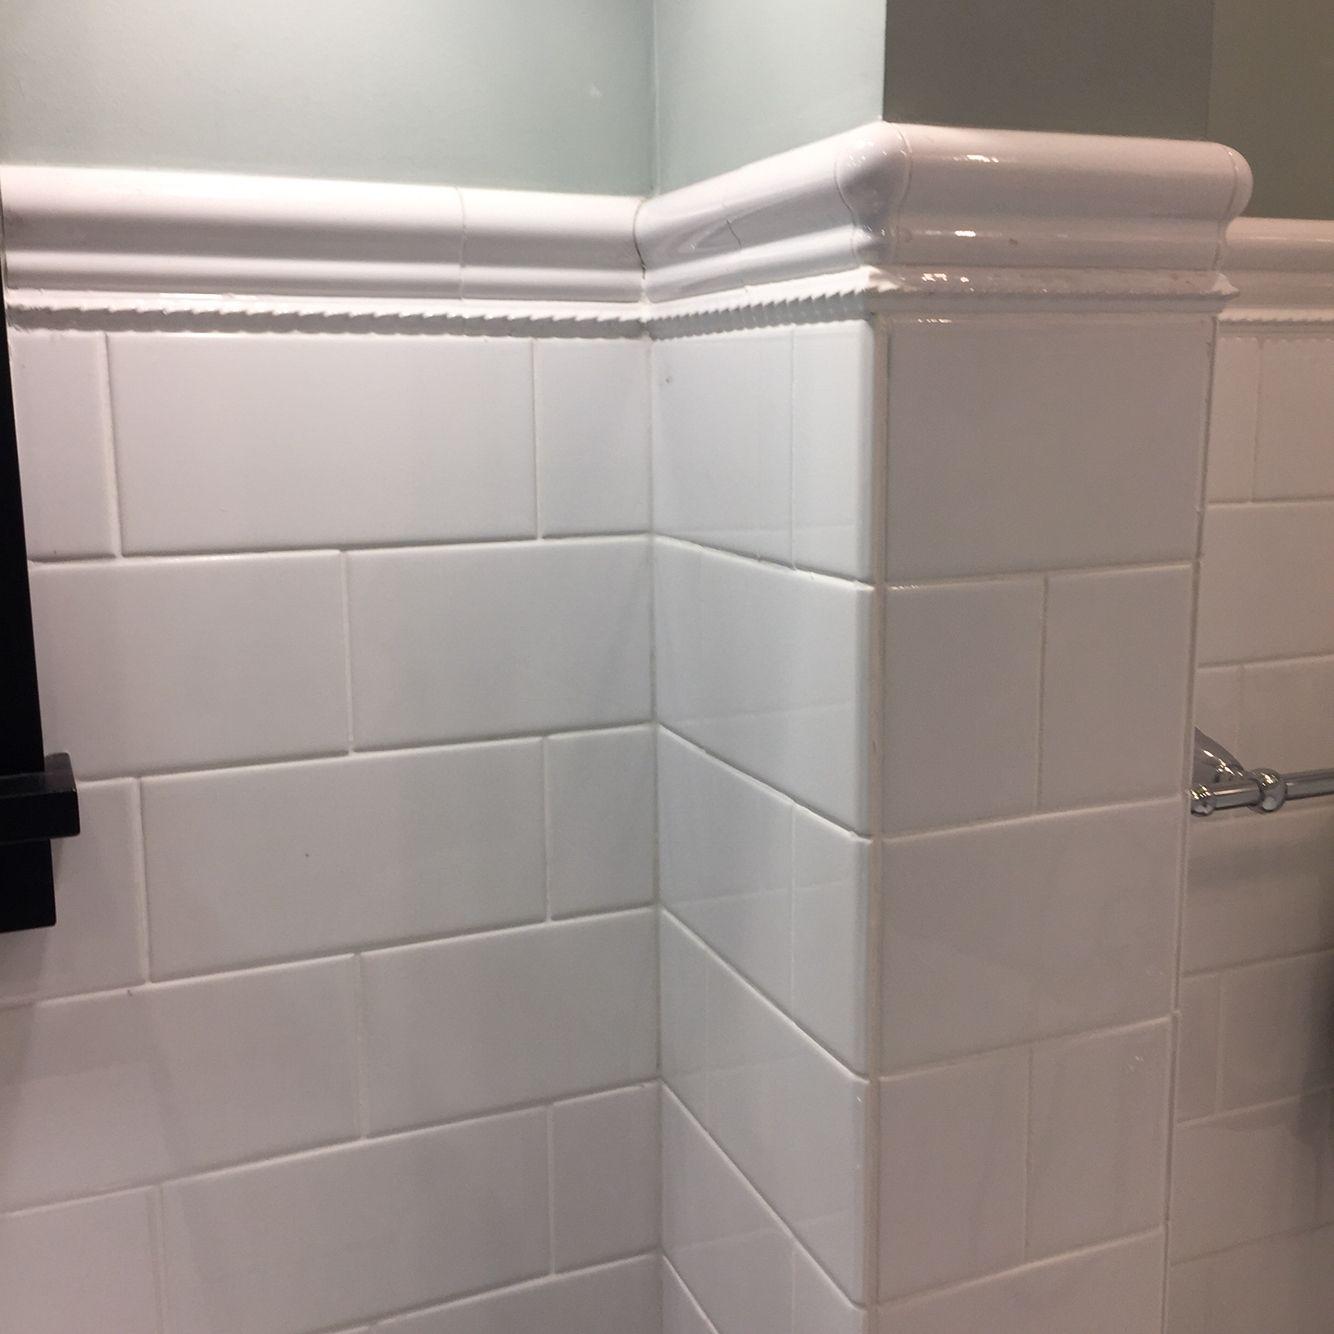 Oversized White Subway Tile With Pencil Roping And Cap Farmhouse Master Bathroom House Bathroom Tile Bathroom